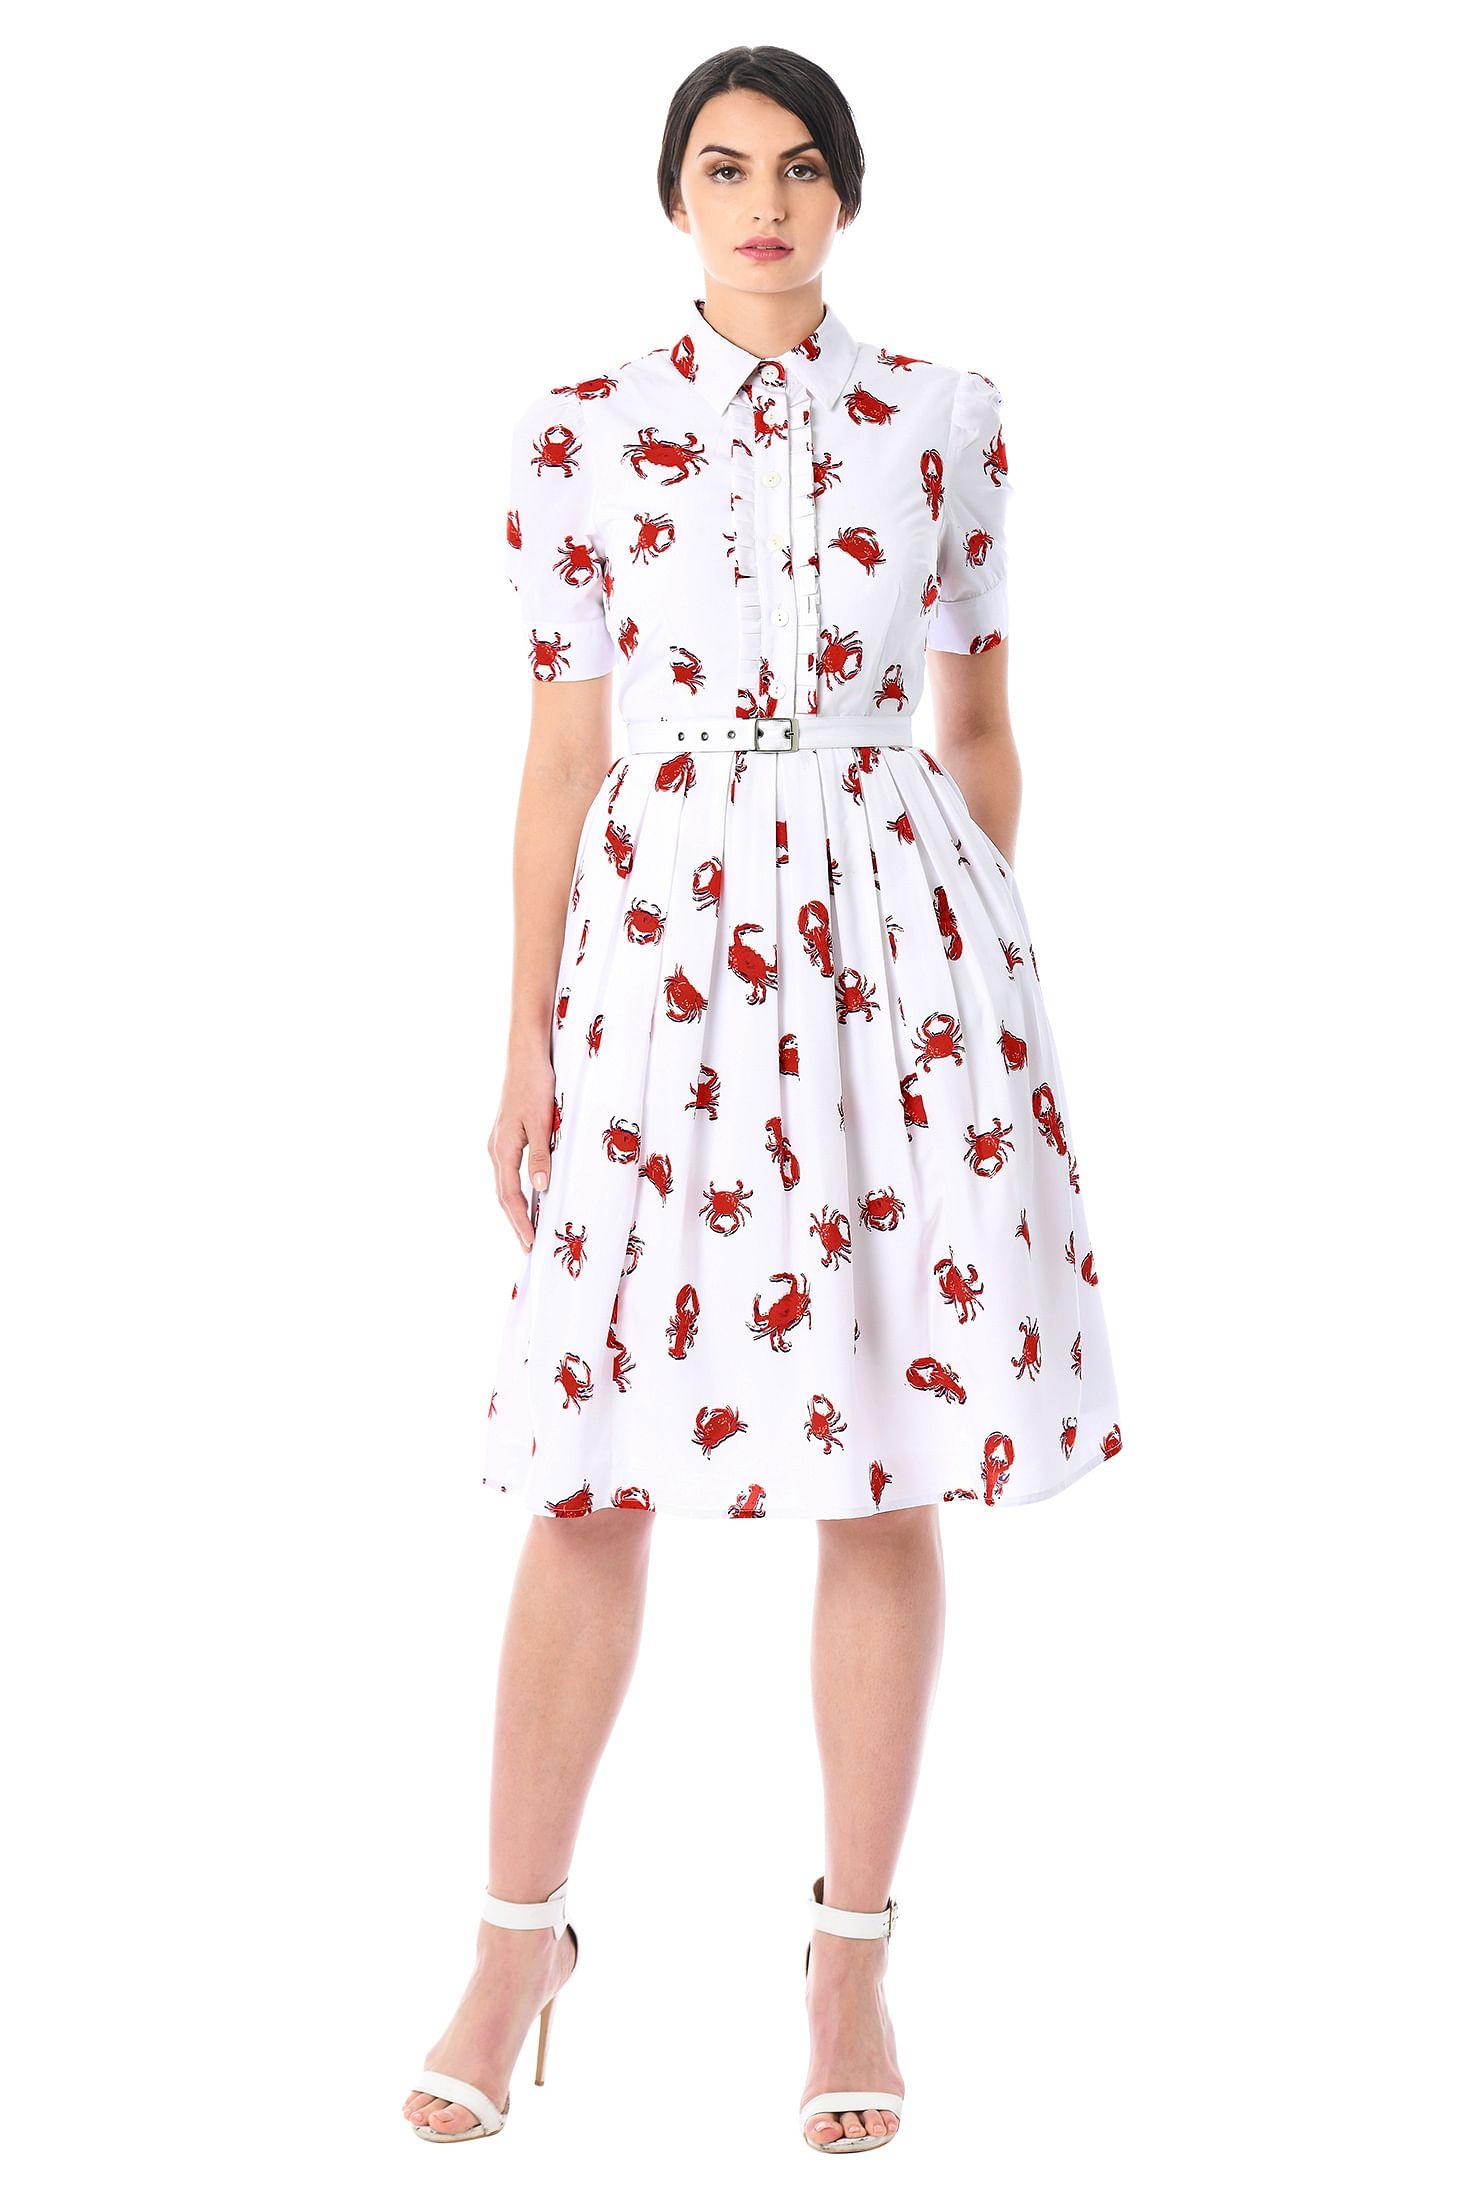 5d405cc70 above elbow sleeve Dresses, below knee length dresses, Box-pleat skirt  dresses,